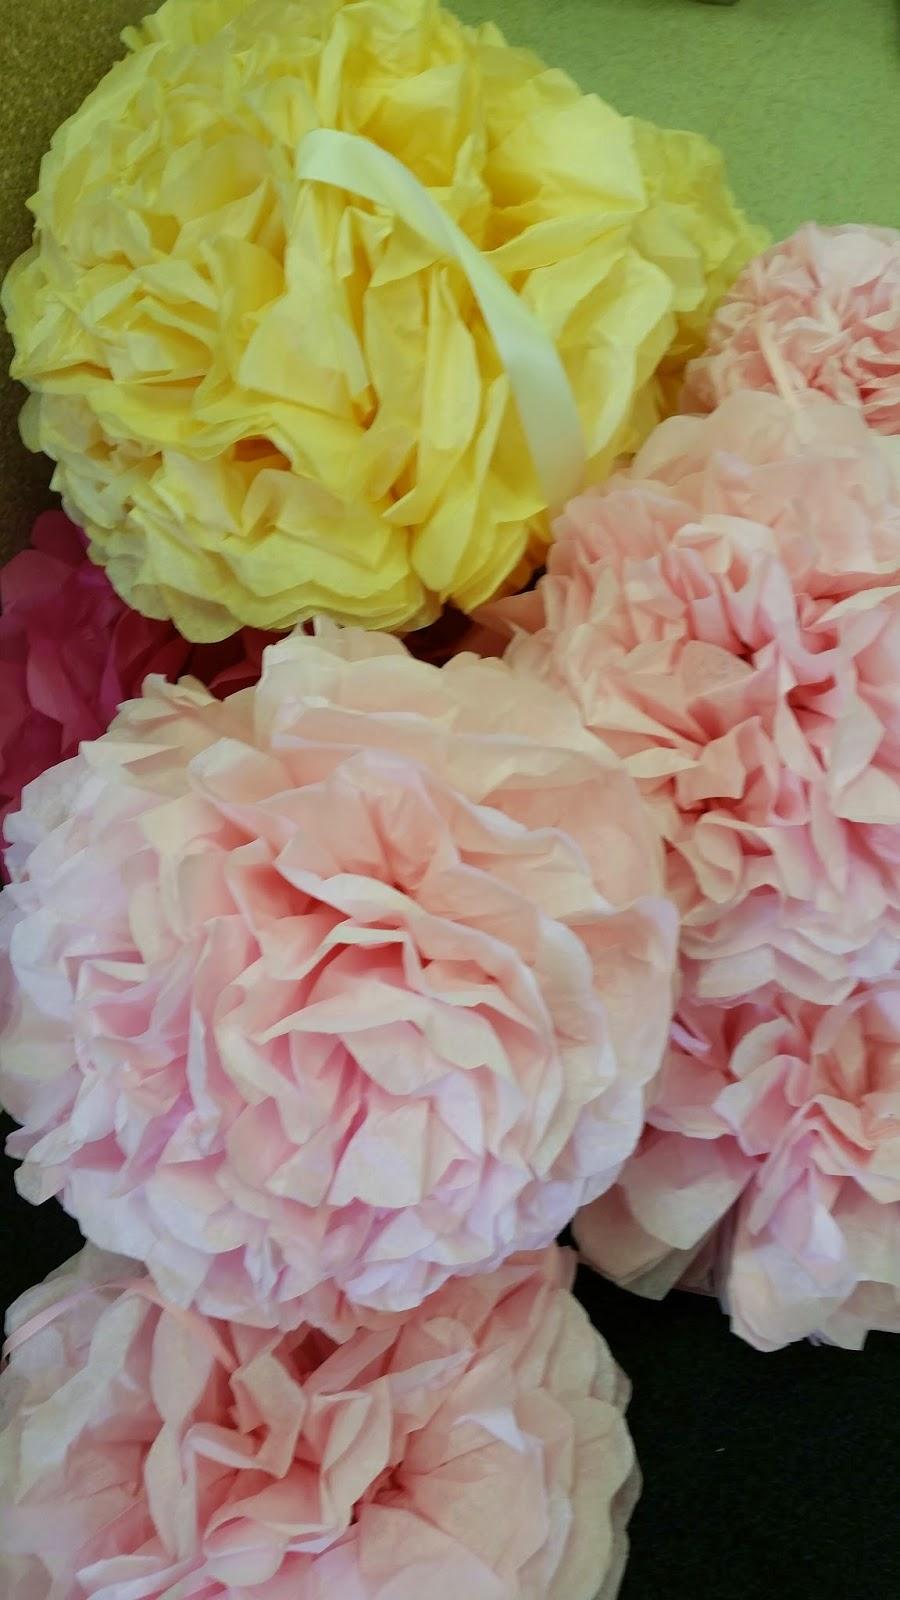 Tissue flowers